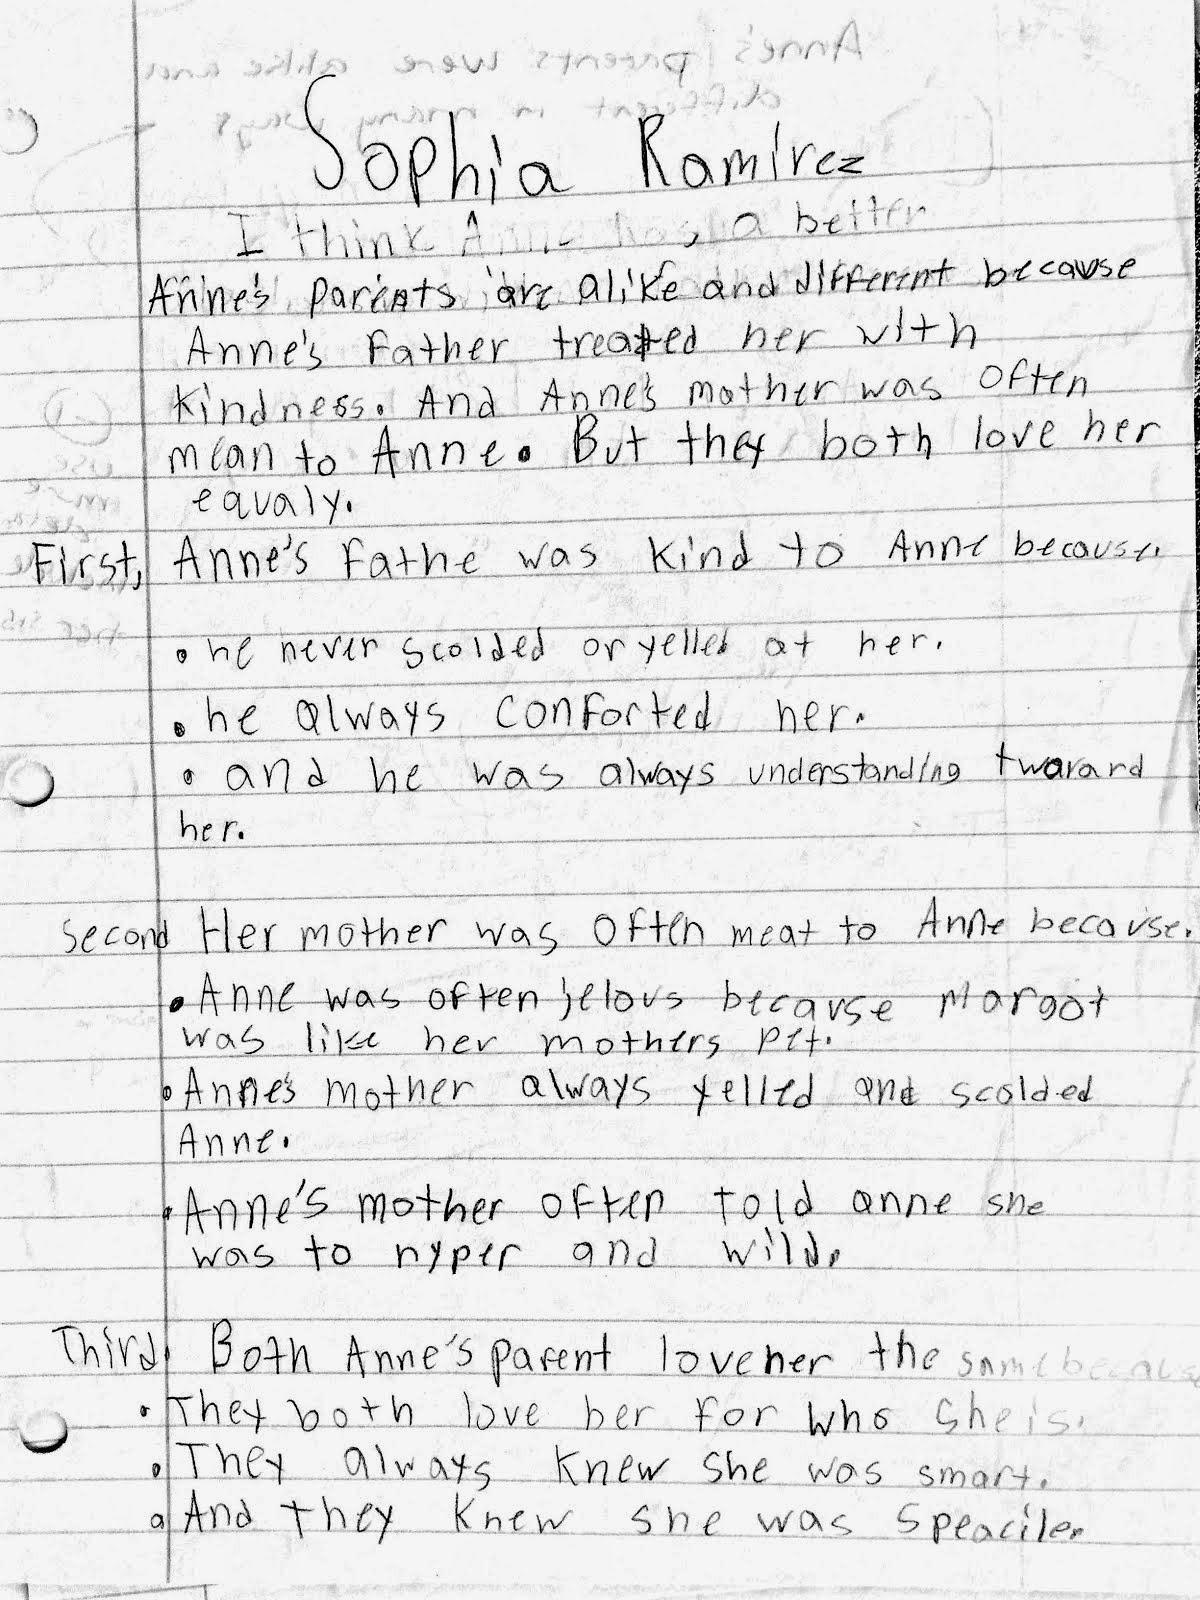 2004 essay contest